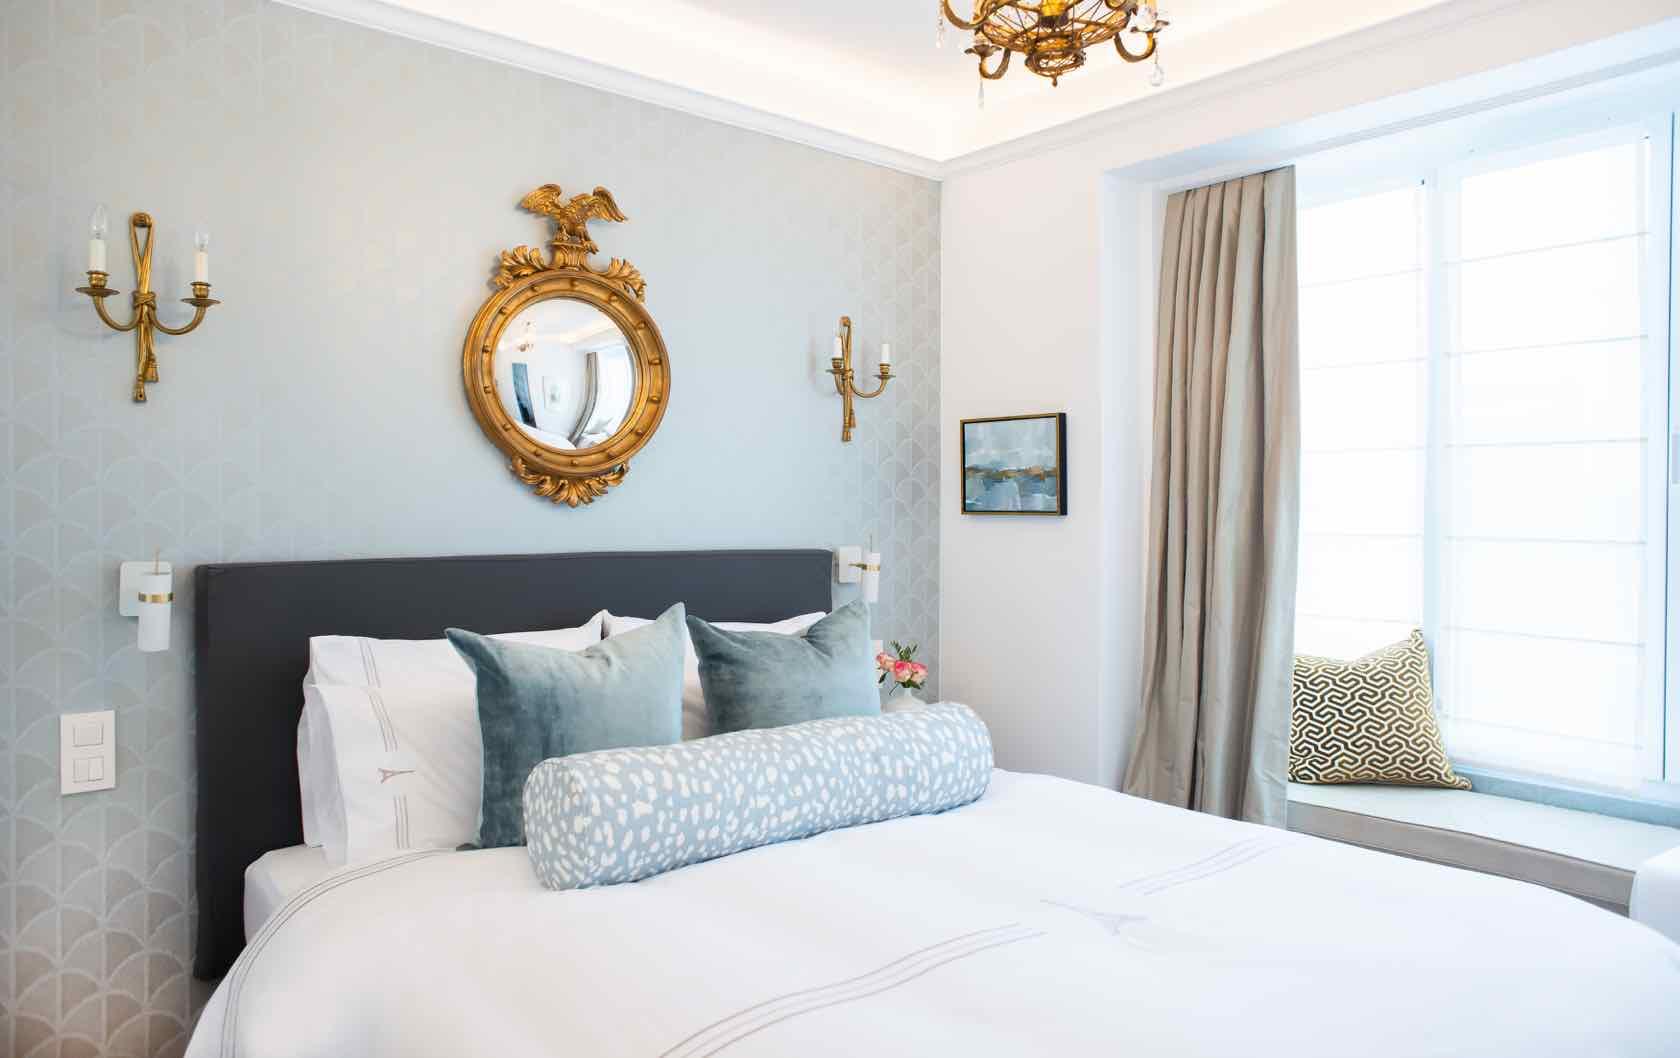 Paris Perfect Shared Vivant Apartment